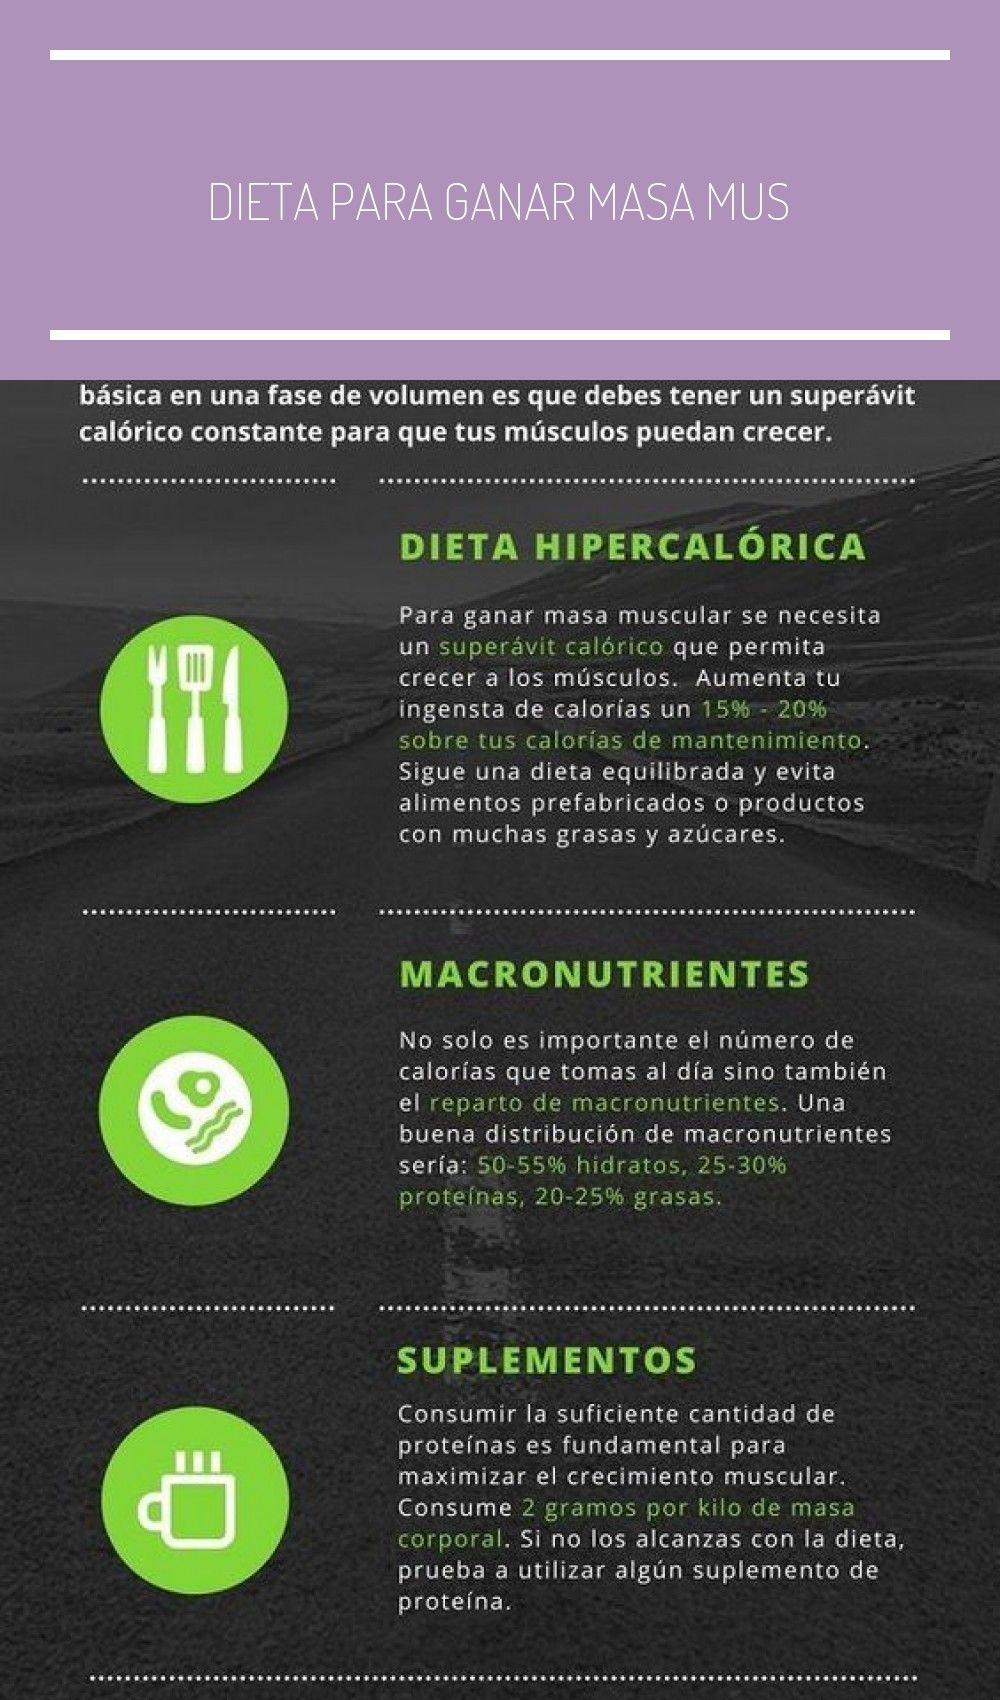 Dieta Para Ganar Masa Muscular Dietas Para Bajar De Peso Y Ganar Musculo Making Resin Jewellery The Cure Dry Leaf